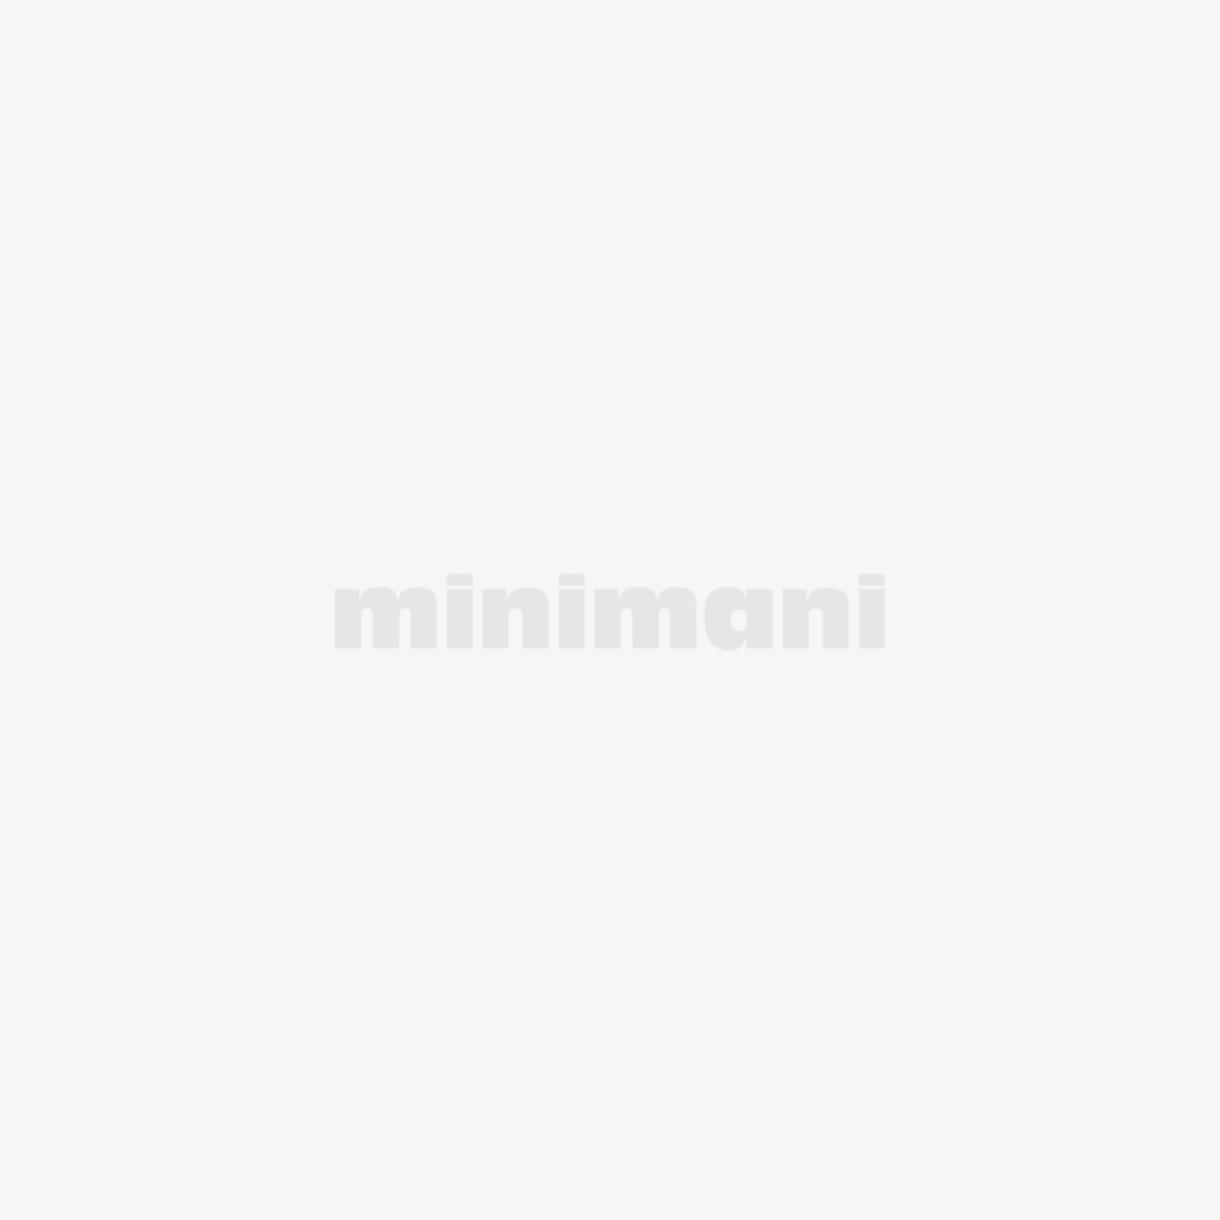 M-FILTER ÖLJYNSUODATIN  MU 1181